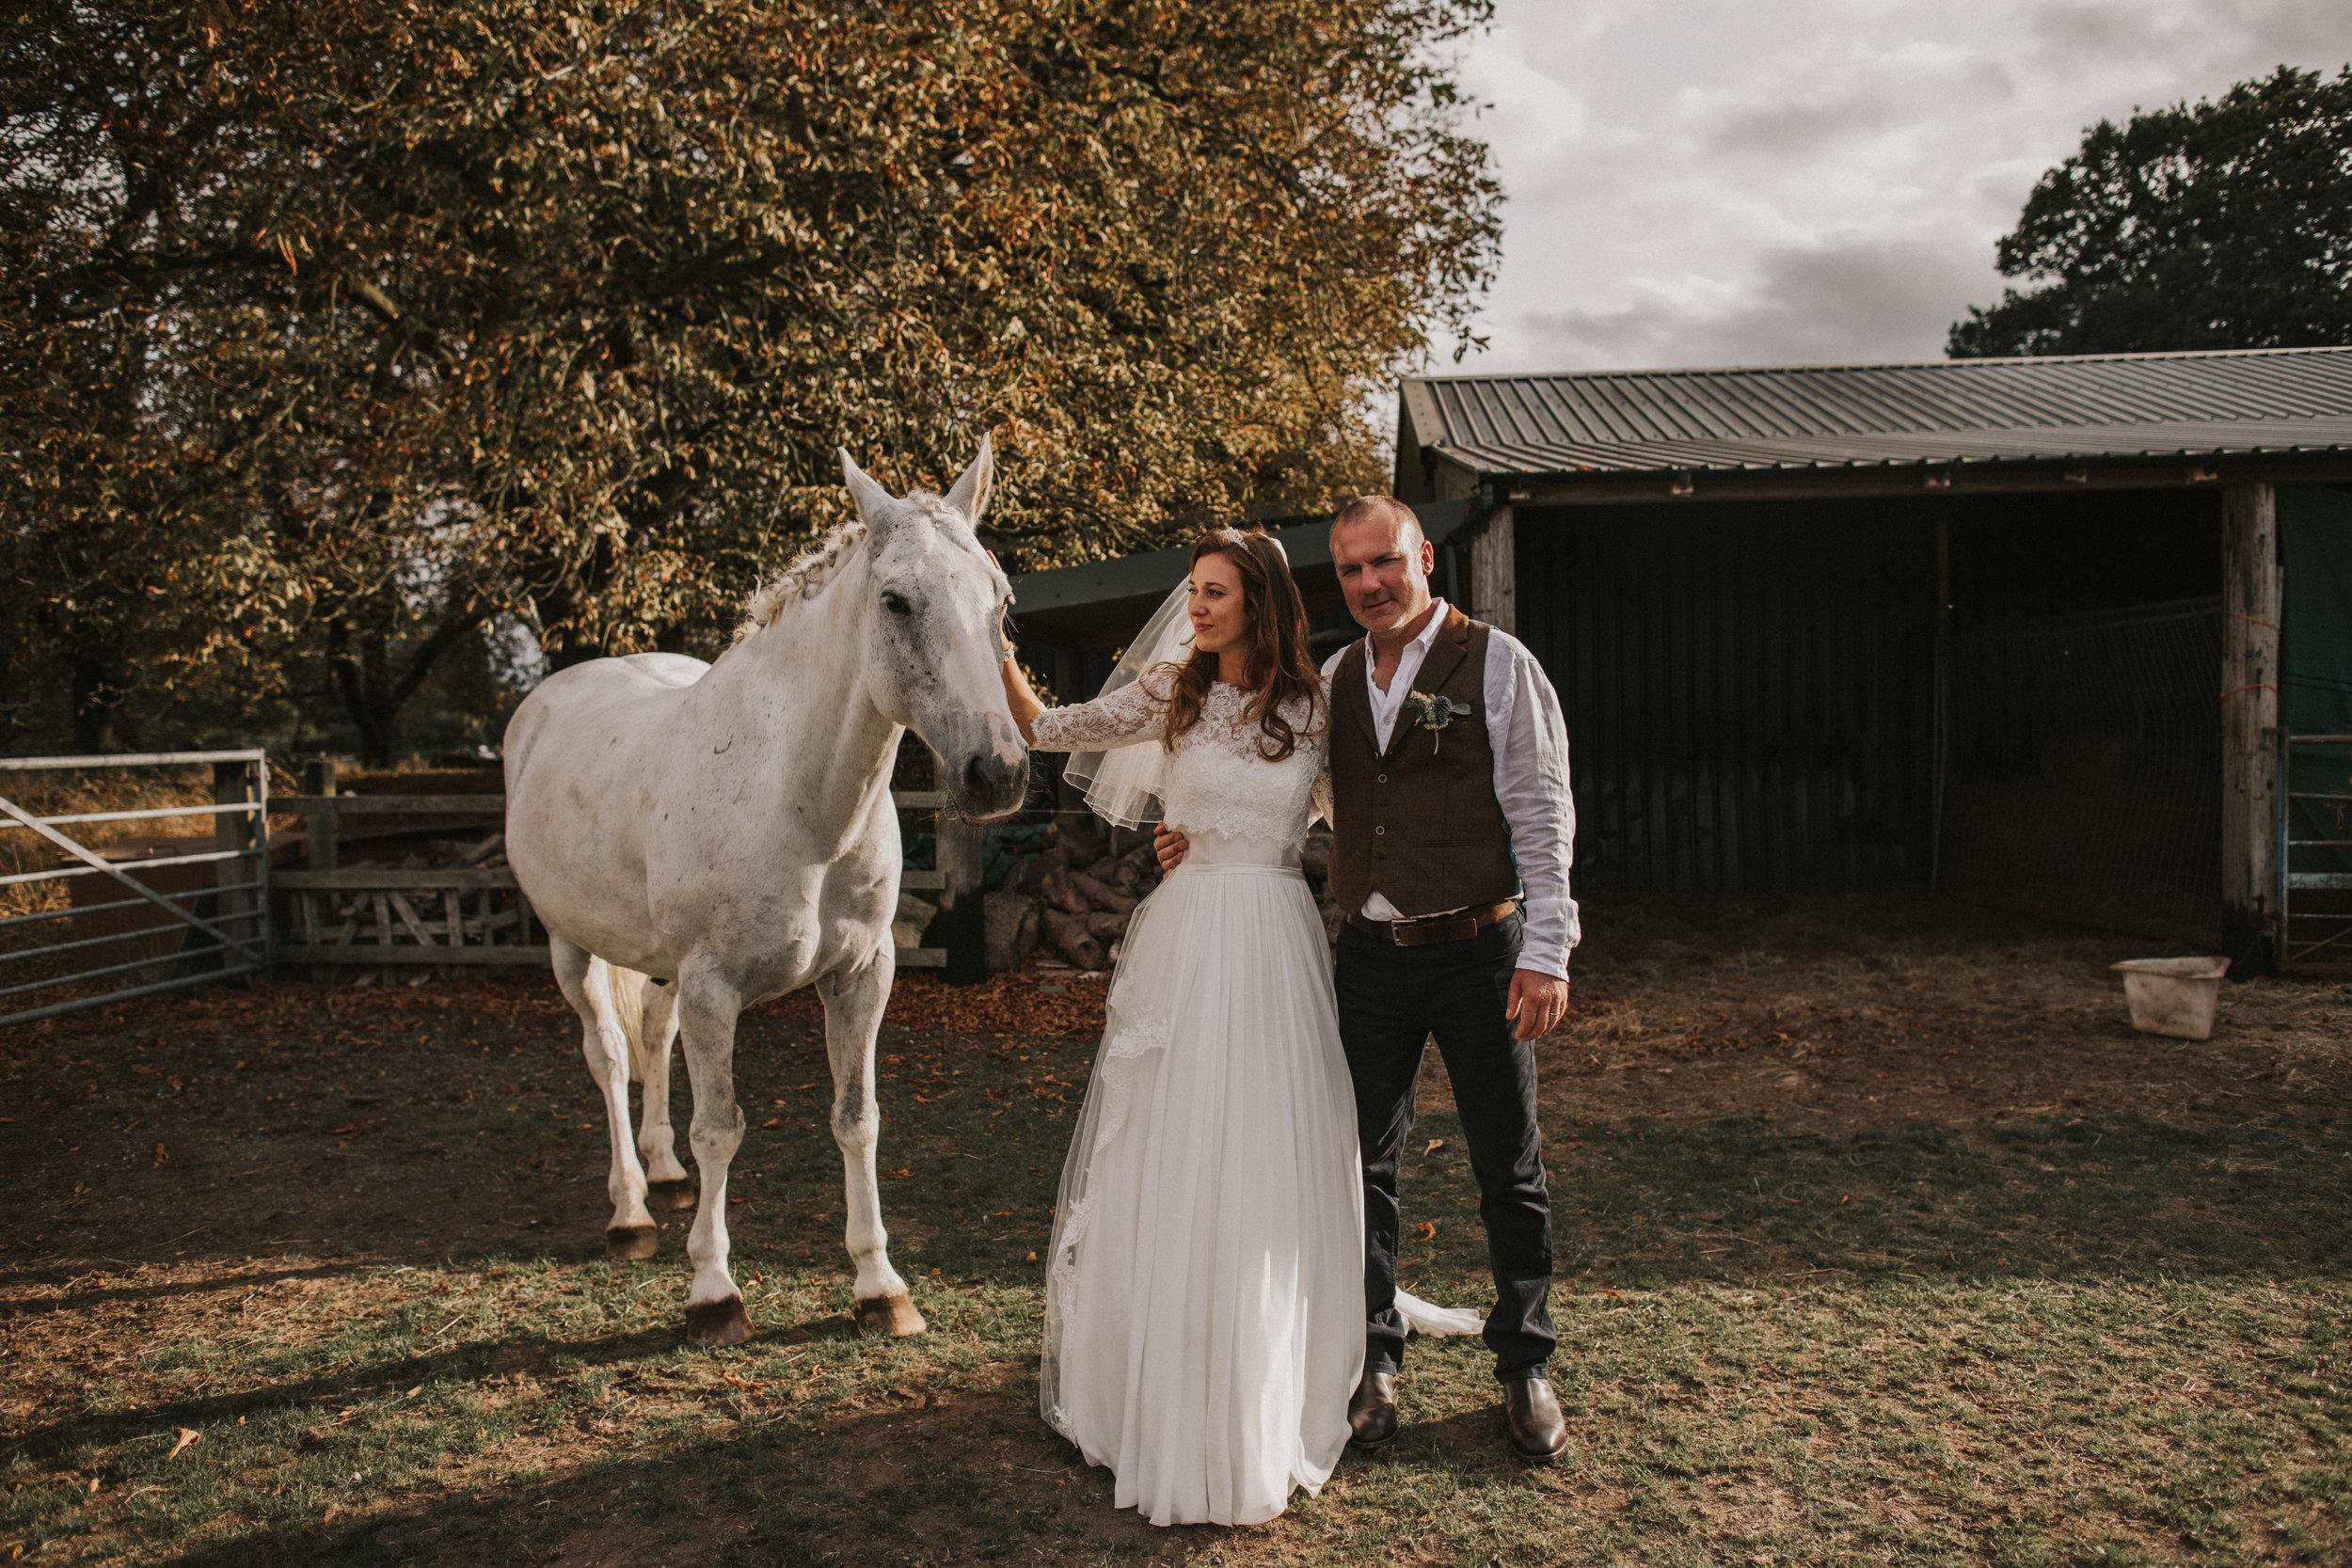 brook rose photography  Farm wedding_82.jpg